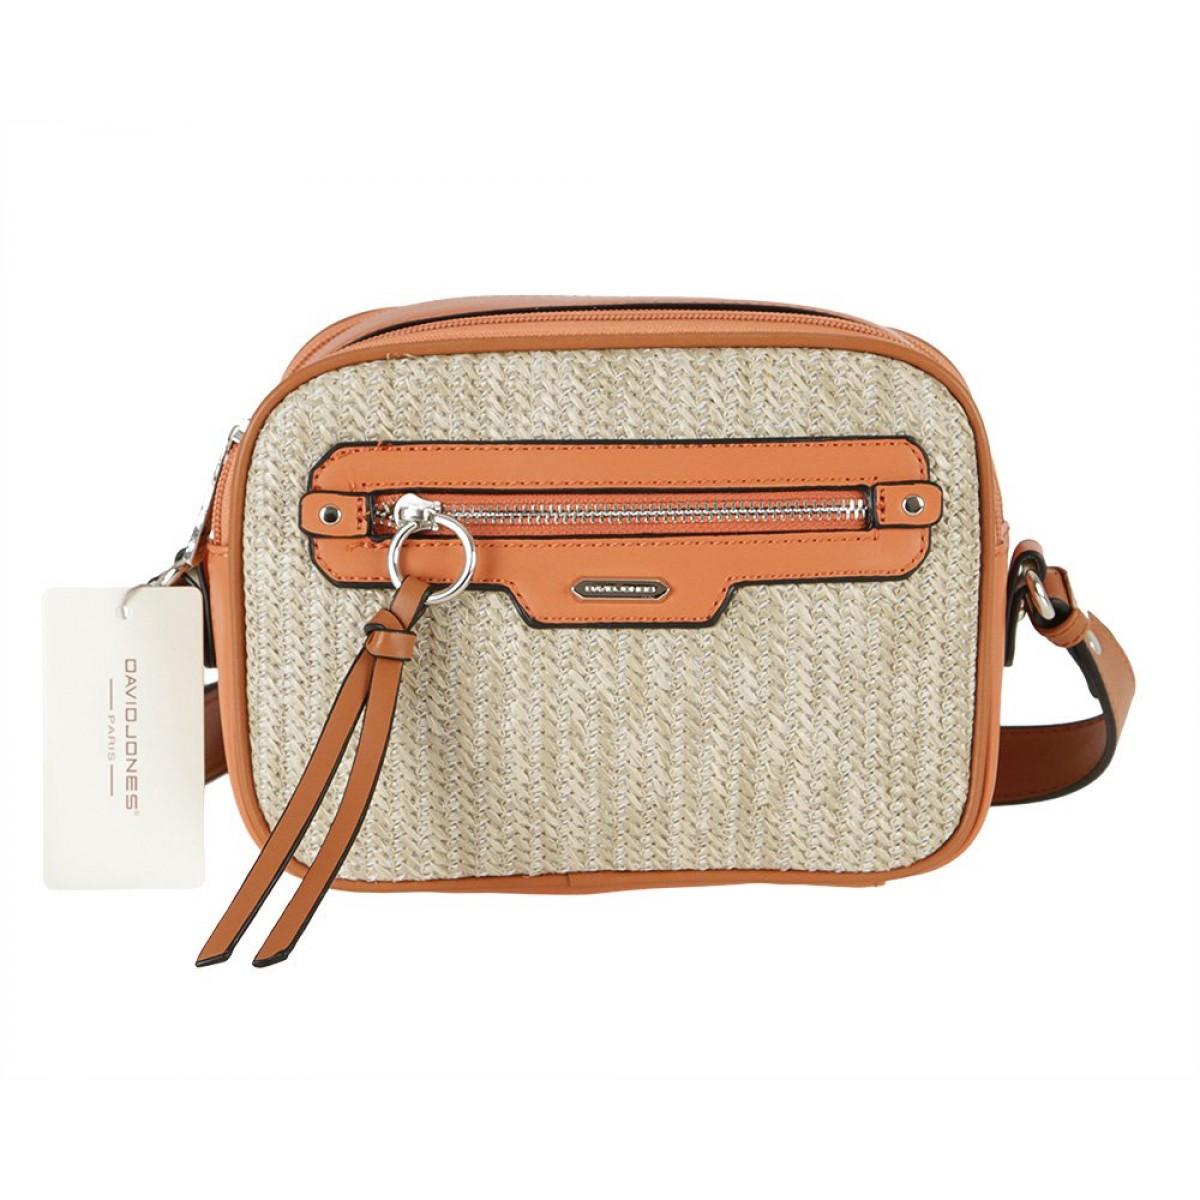 Жіноча сумка David Jones CM5756 CORAL